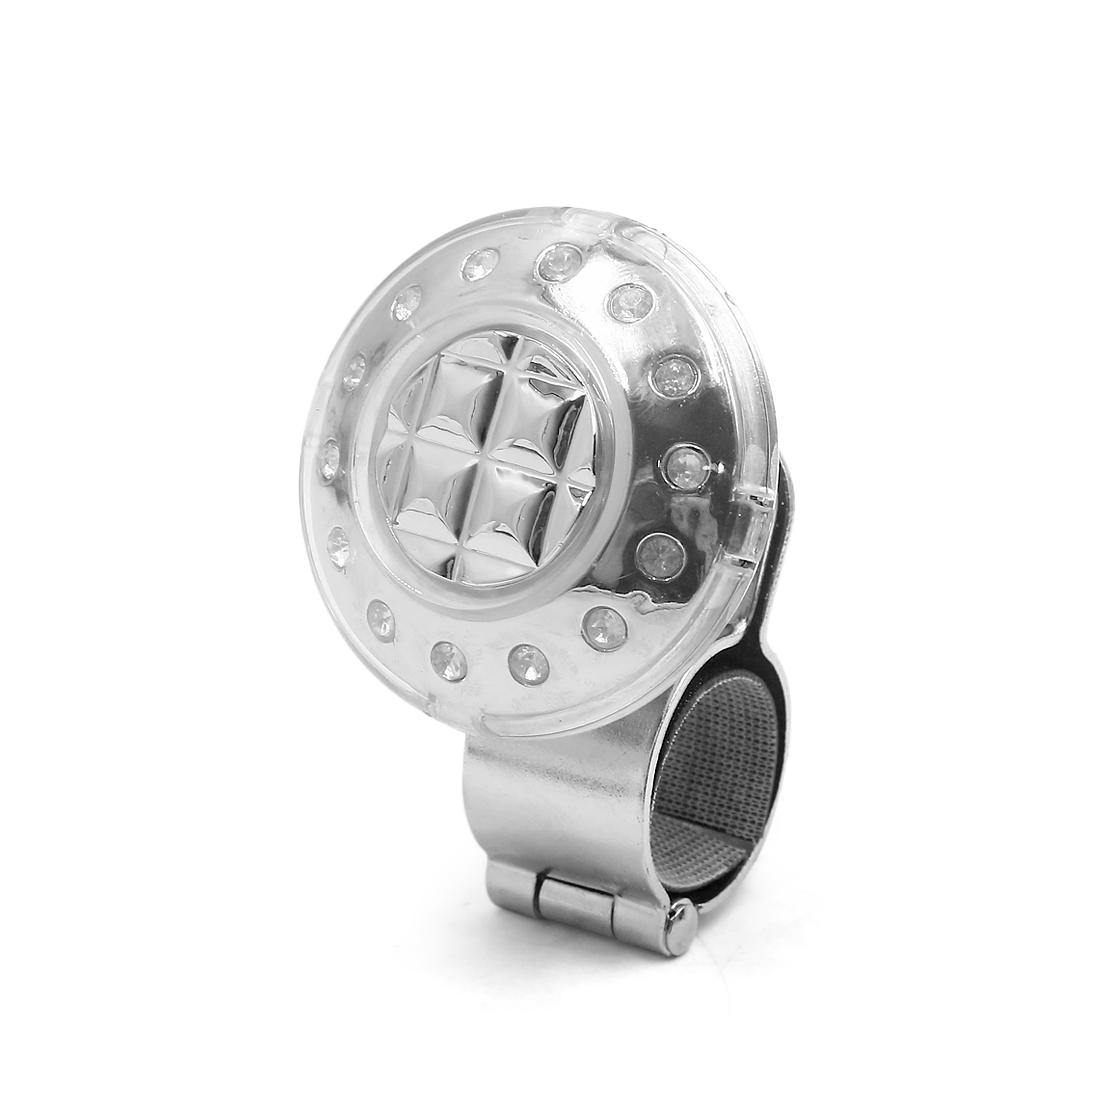 Silver Tone Faux Diamond Car Steering Wheel Spinner Power Handle Knob Booster